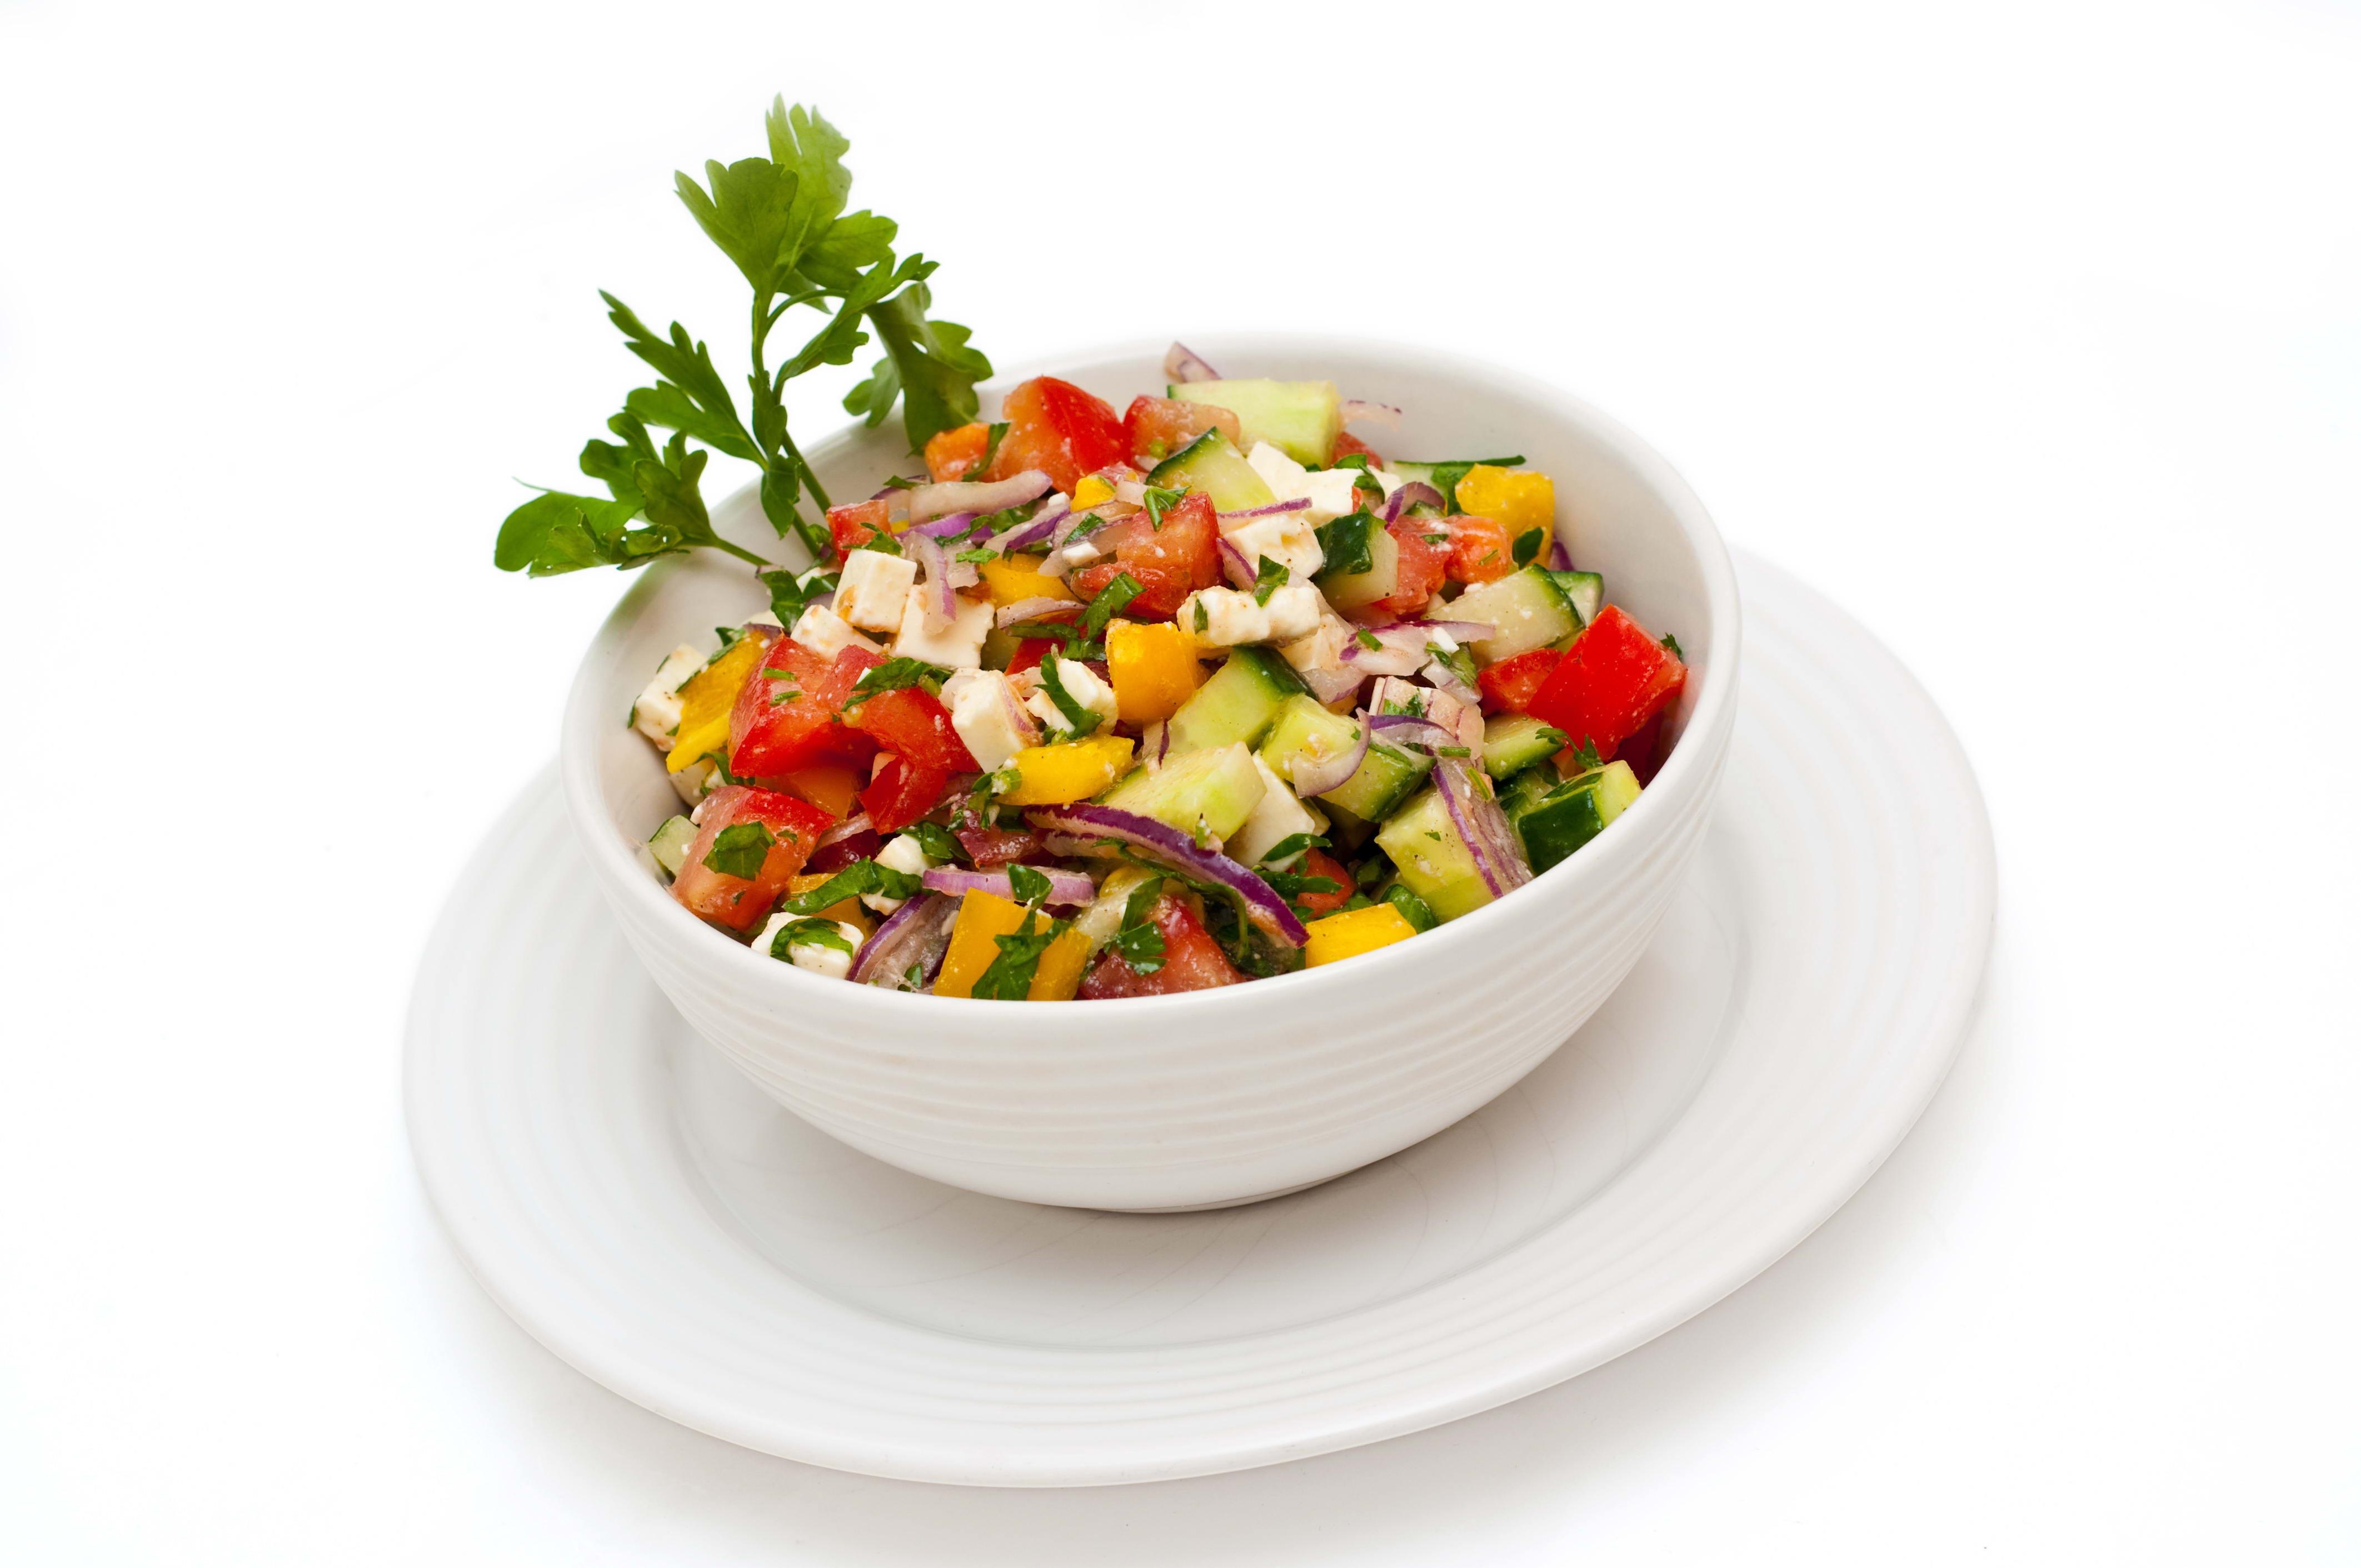 Wallpaper white background vegetables salad parsley